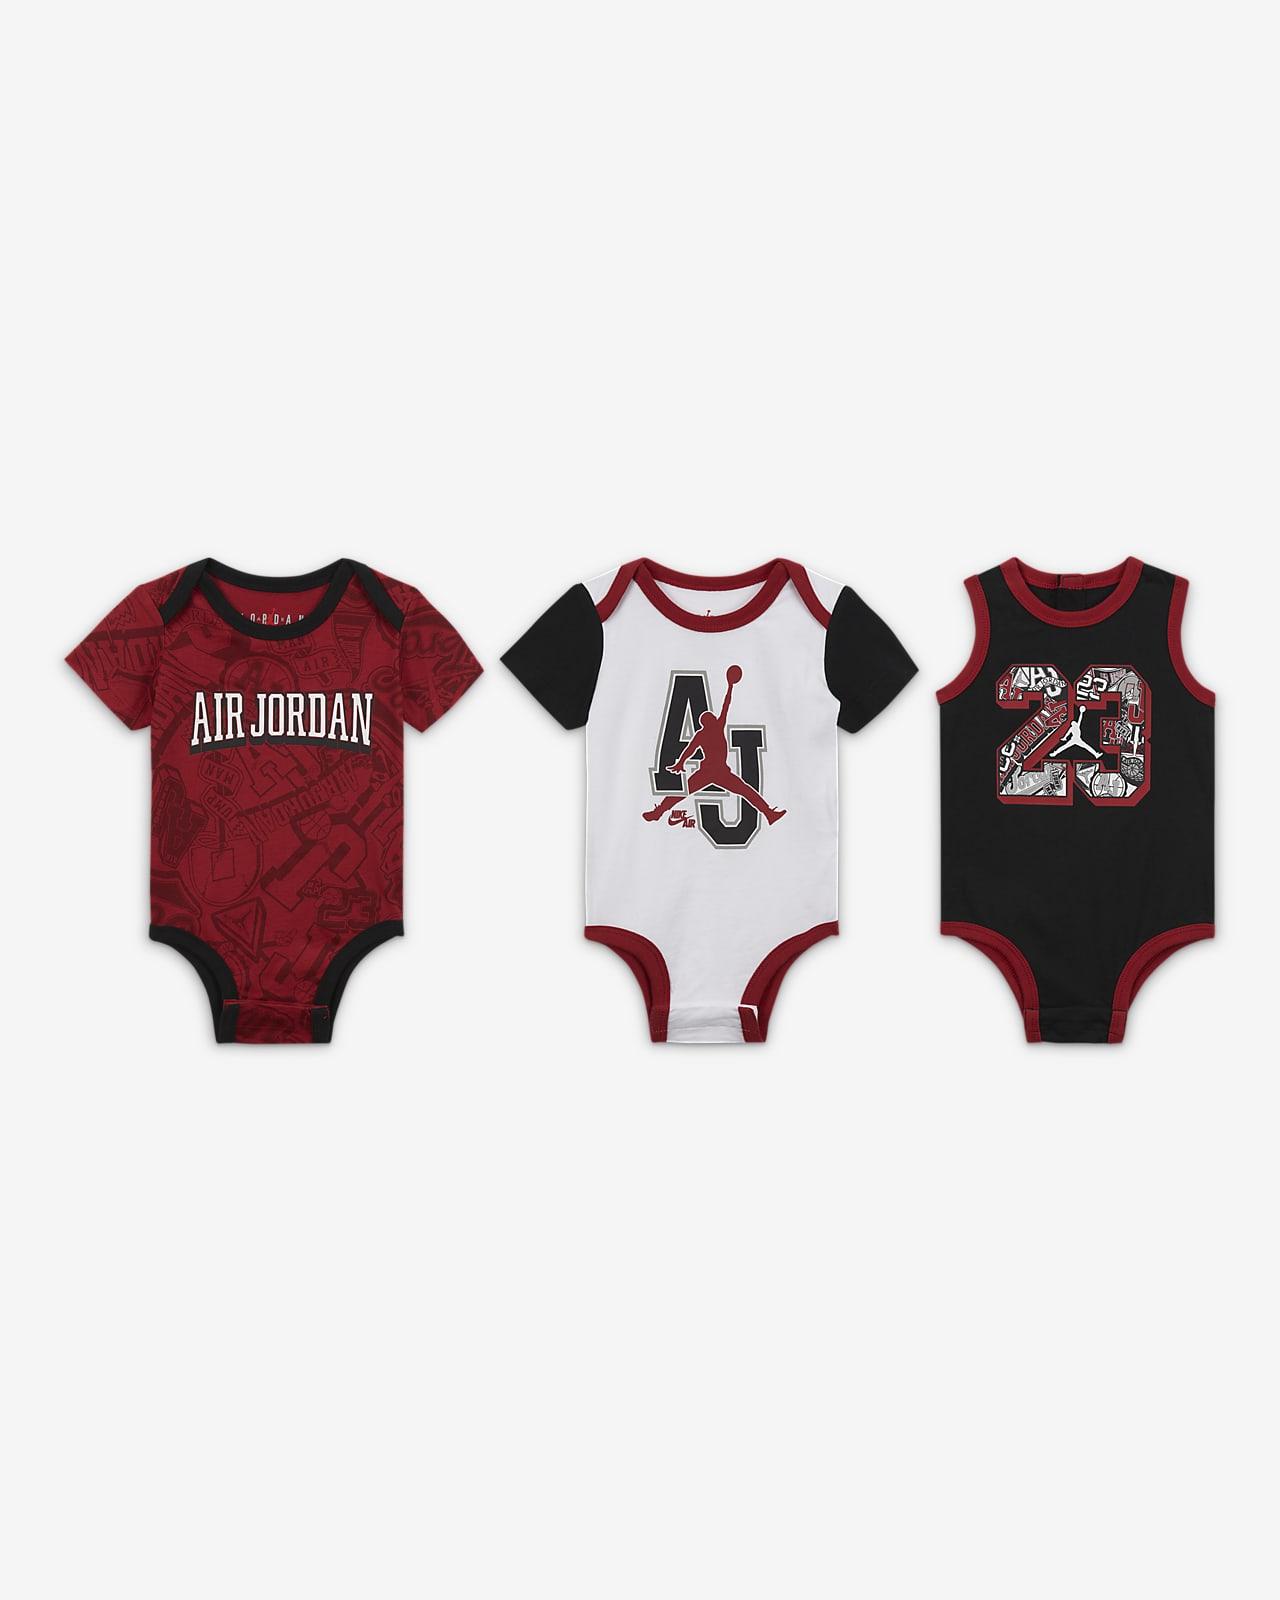 Jordan Baby (0-9M) Bodysuit Set (3-Pack)